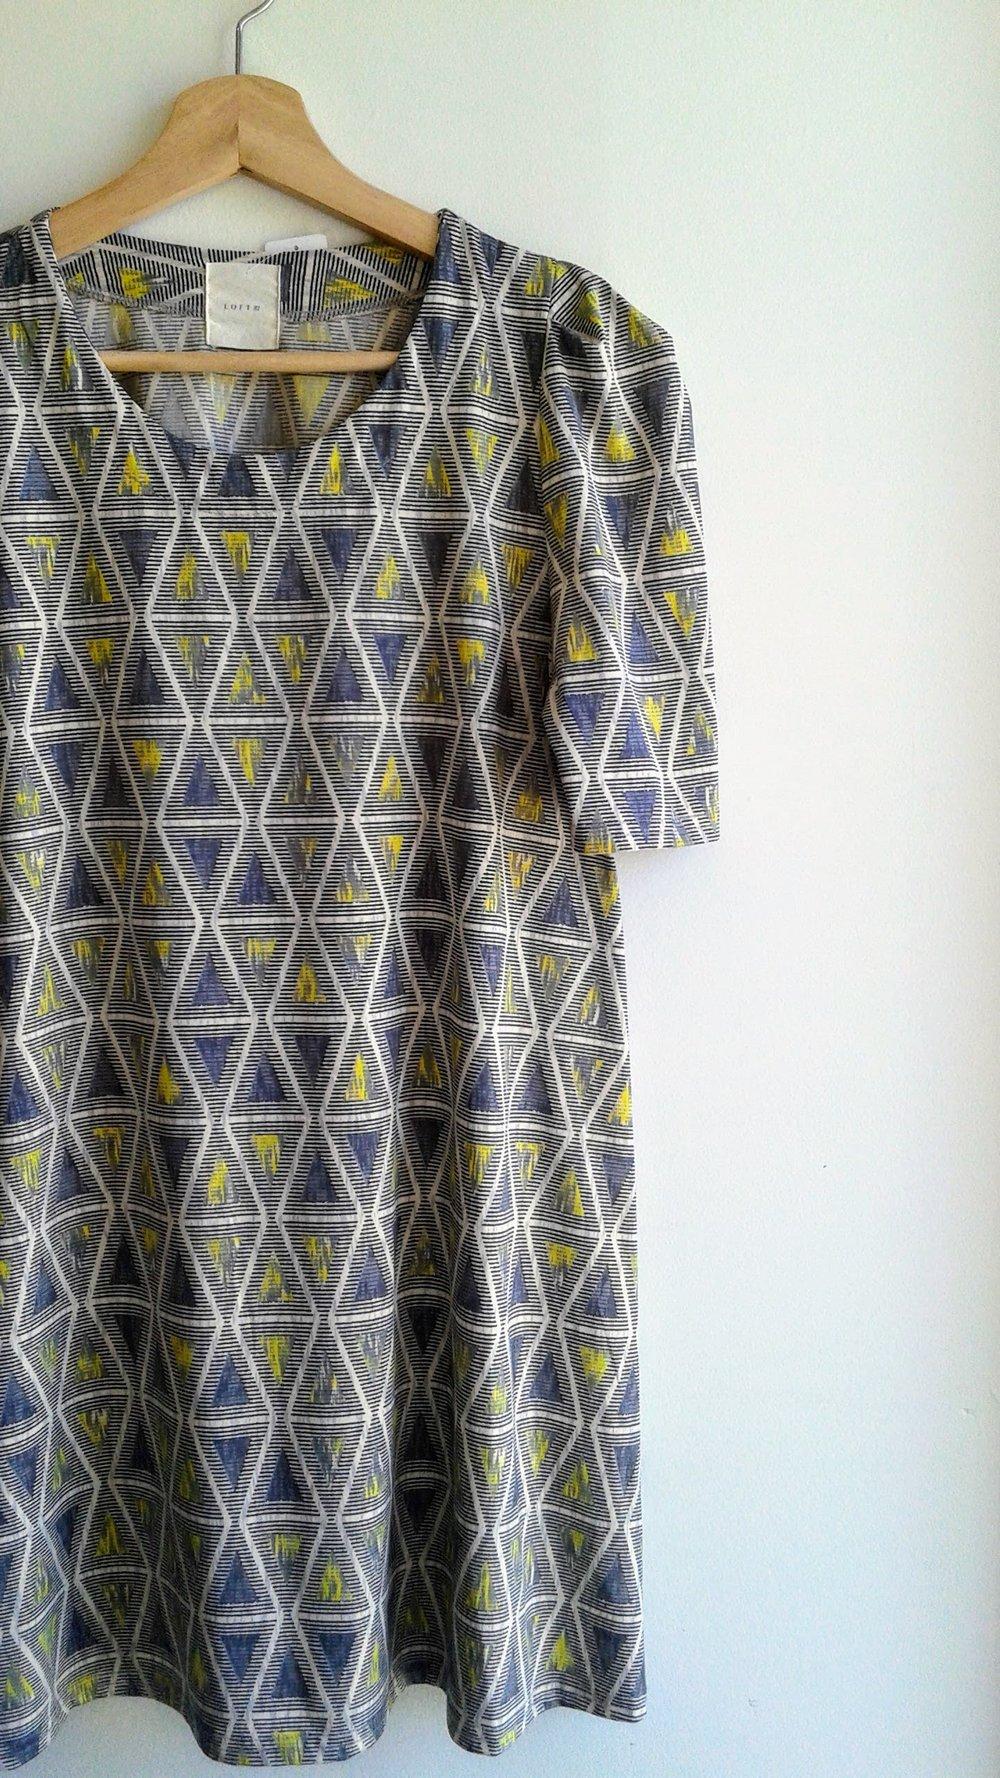 Loft 82 dress; Size S, $36